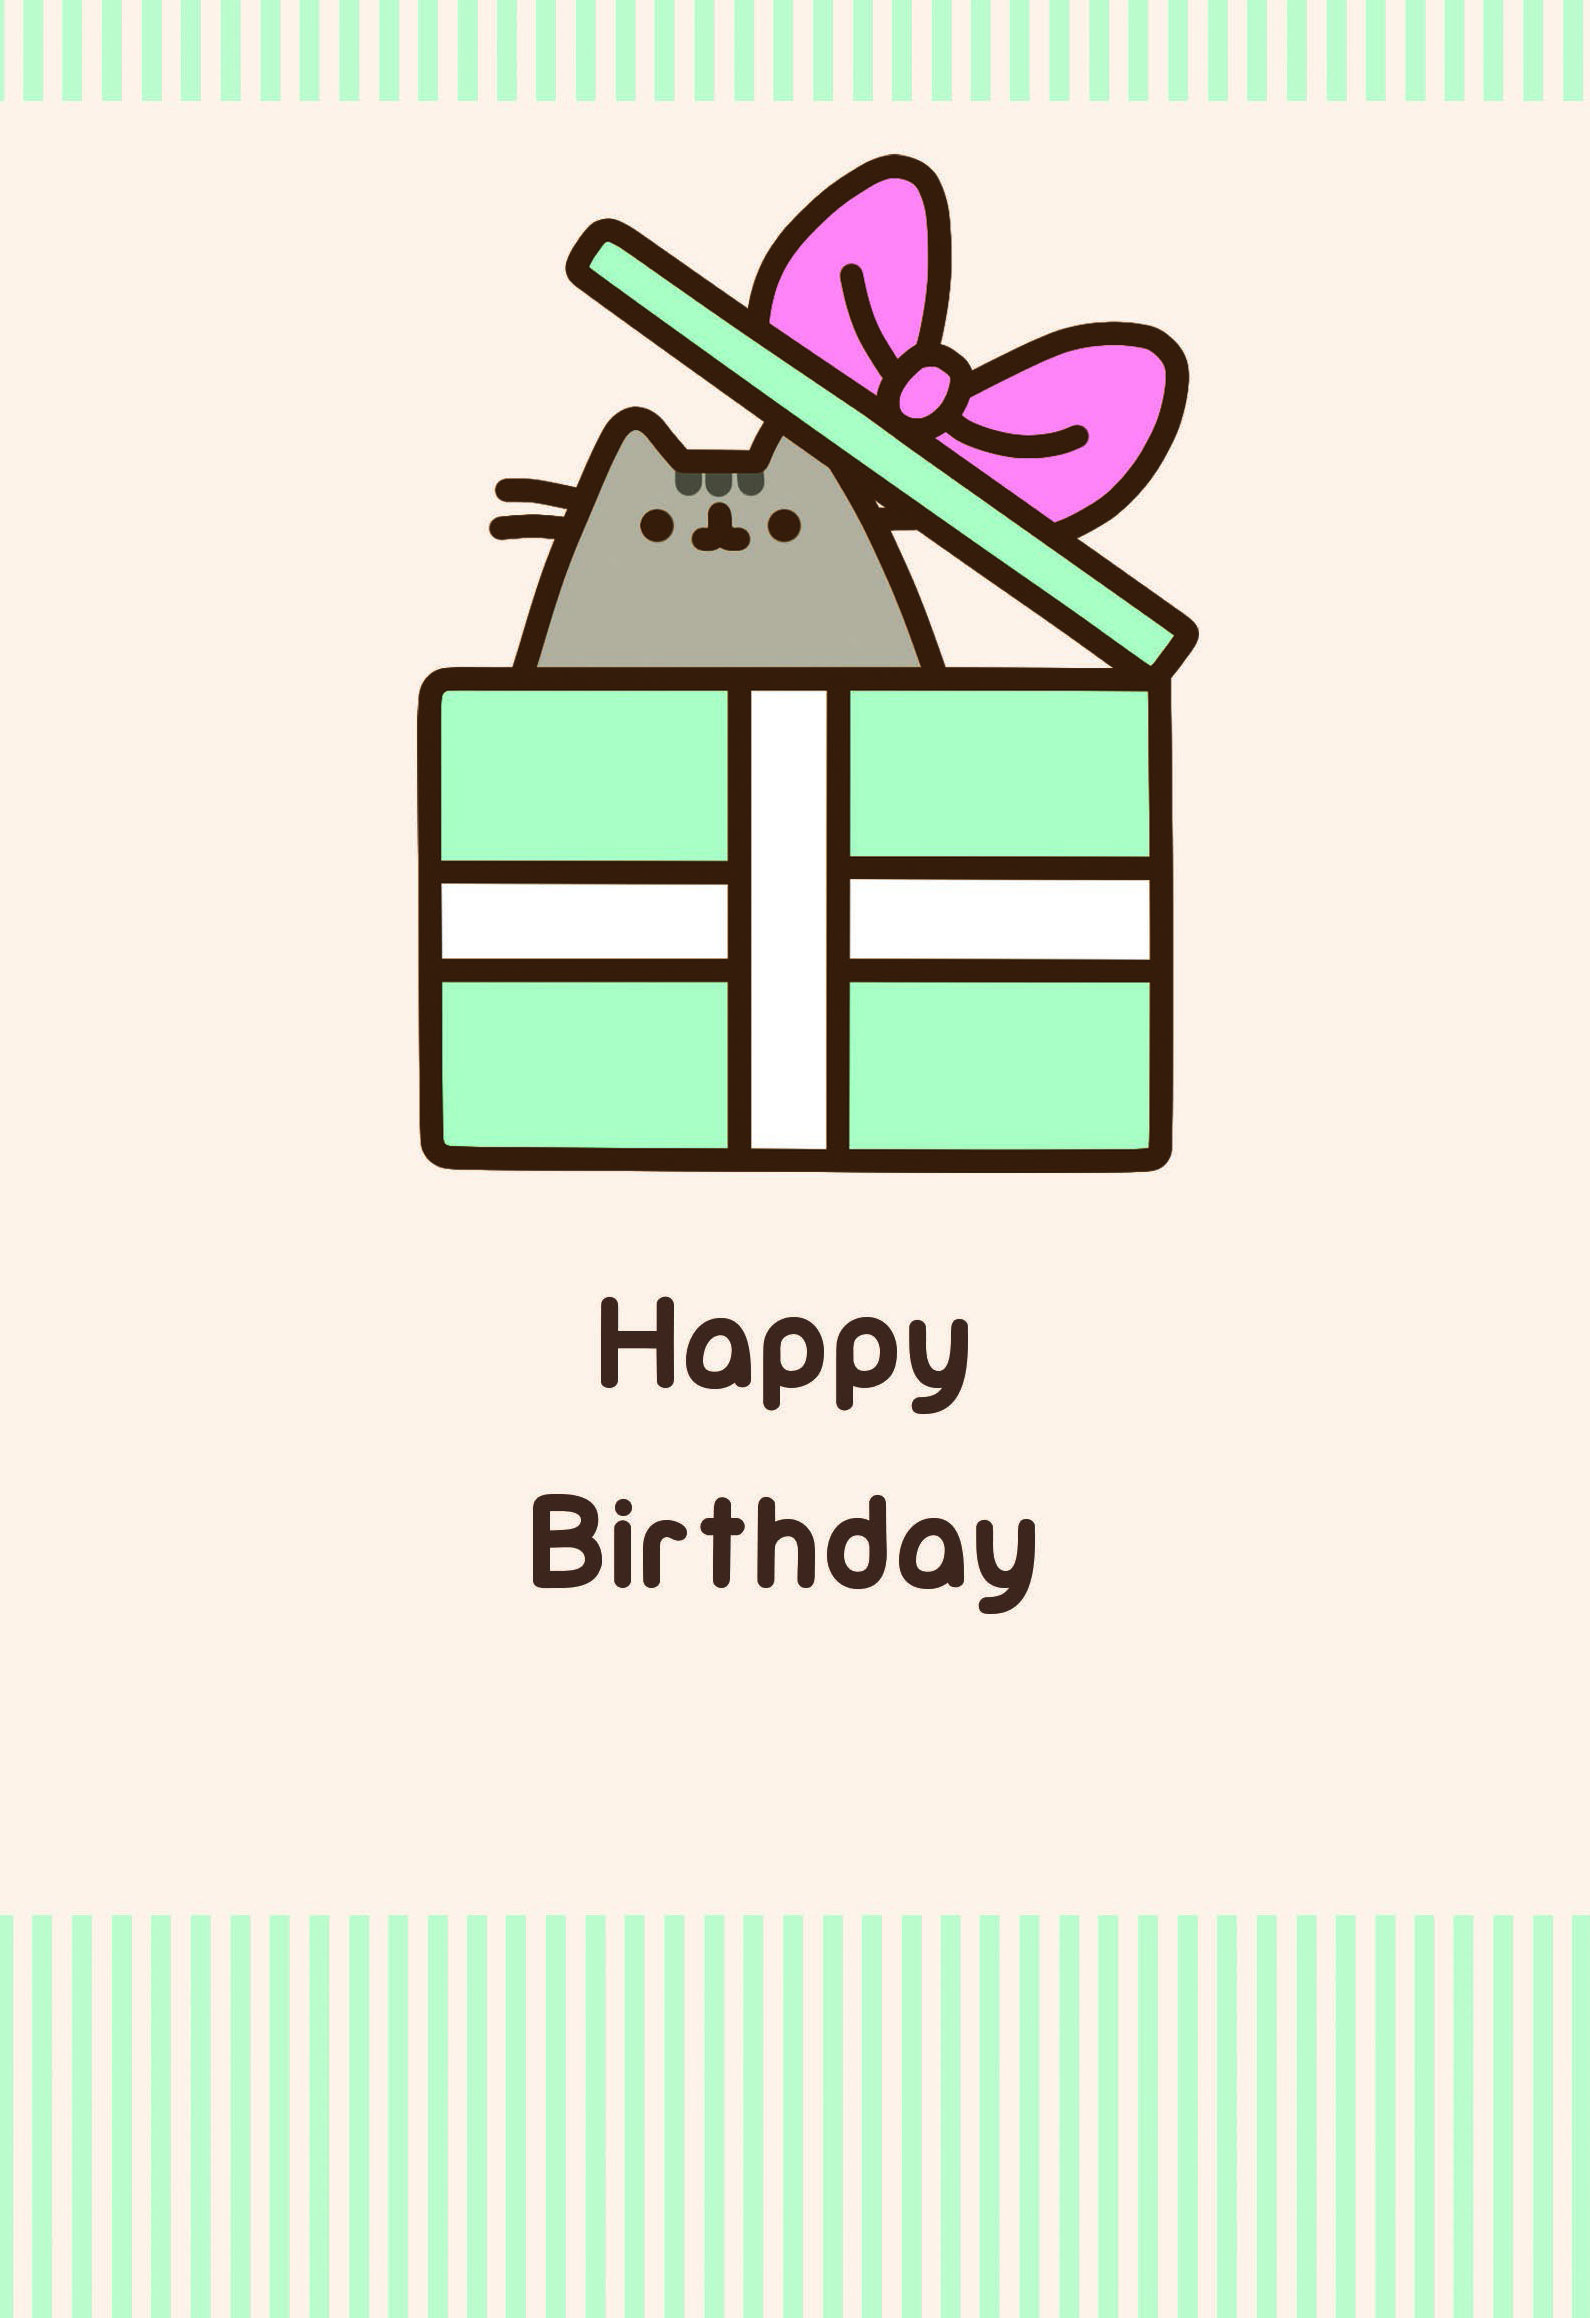 Pusheen 'Happy Birthday' card from Gemma International